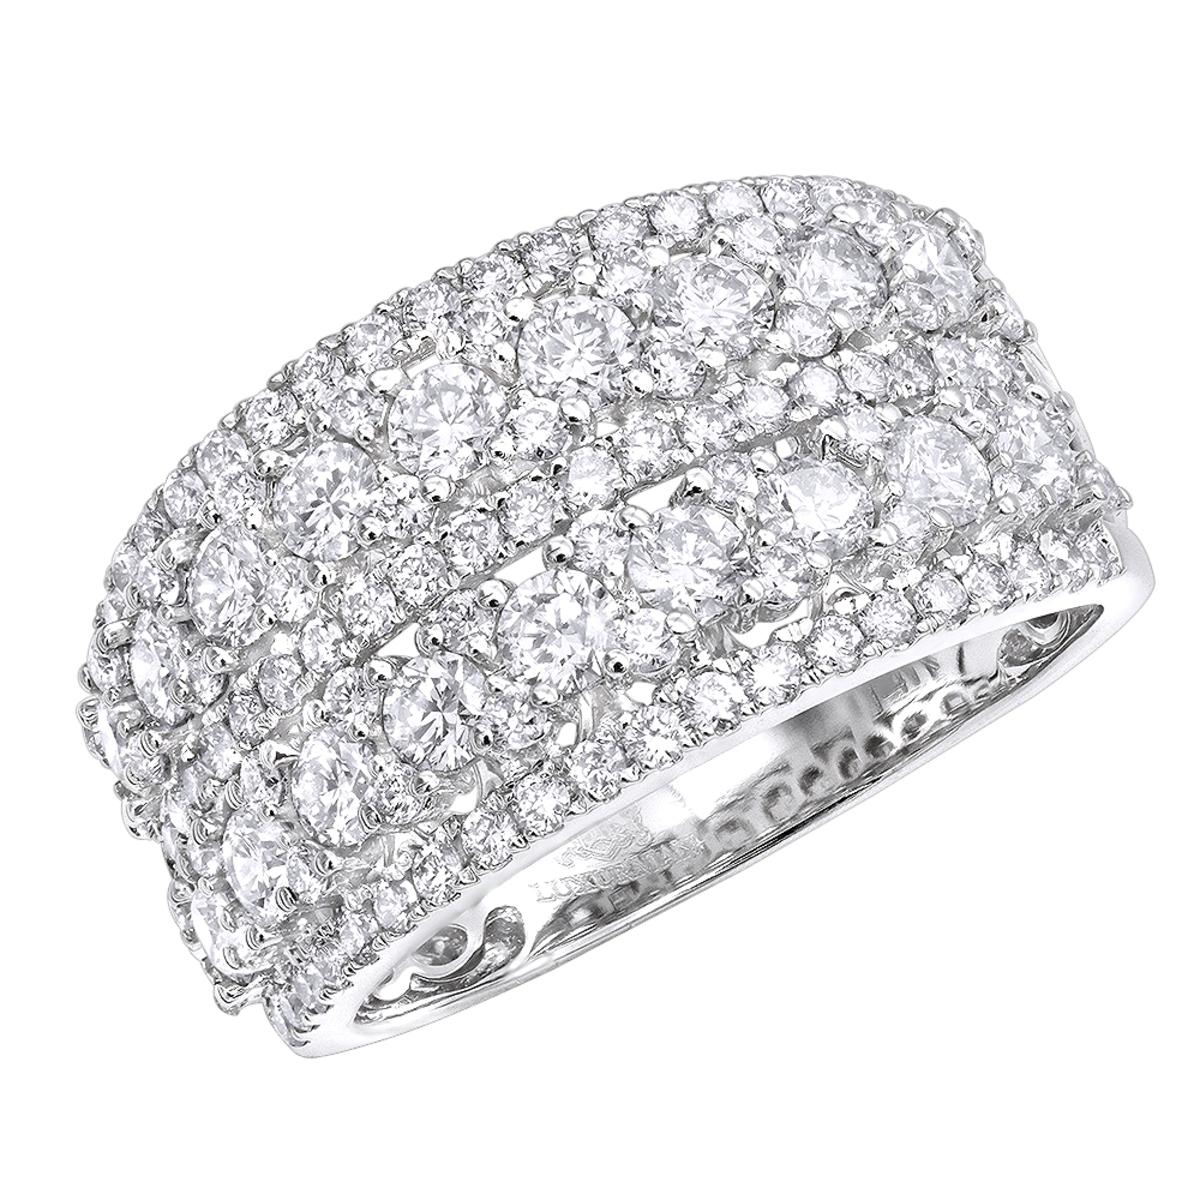 14k Gold Diamond Ring for Women 2 Carat Unique Diamond Wedding Band